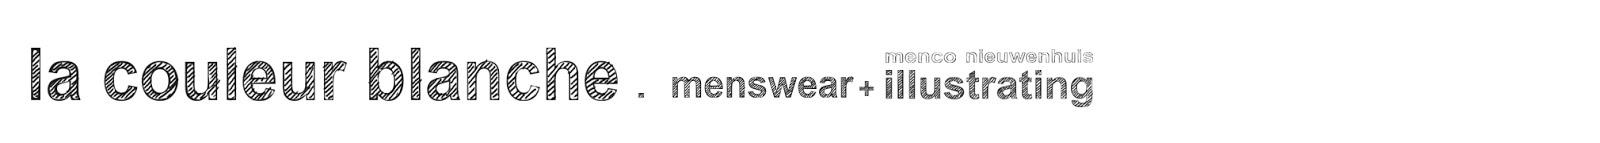 la couleur blanche // menco nieuwenhuis menswear blog